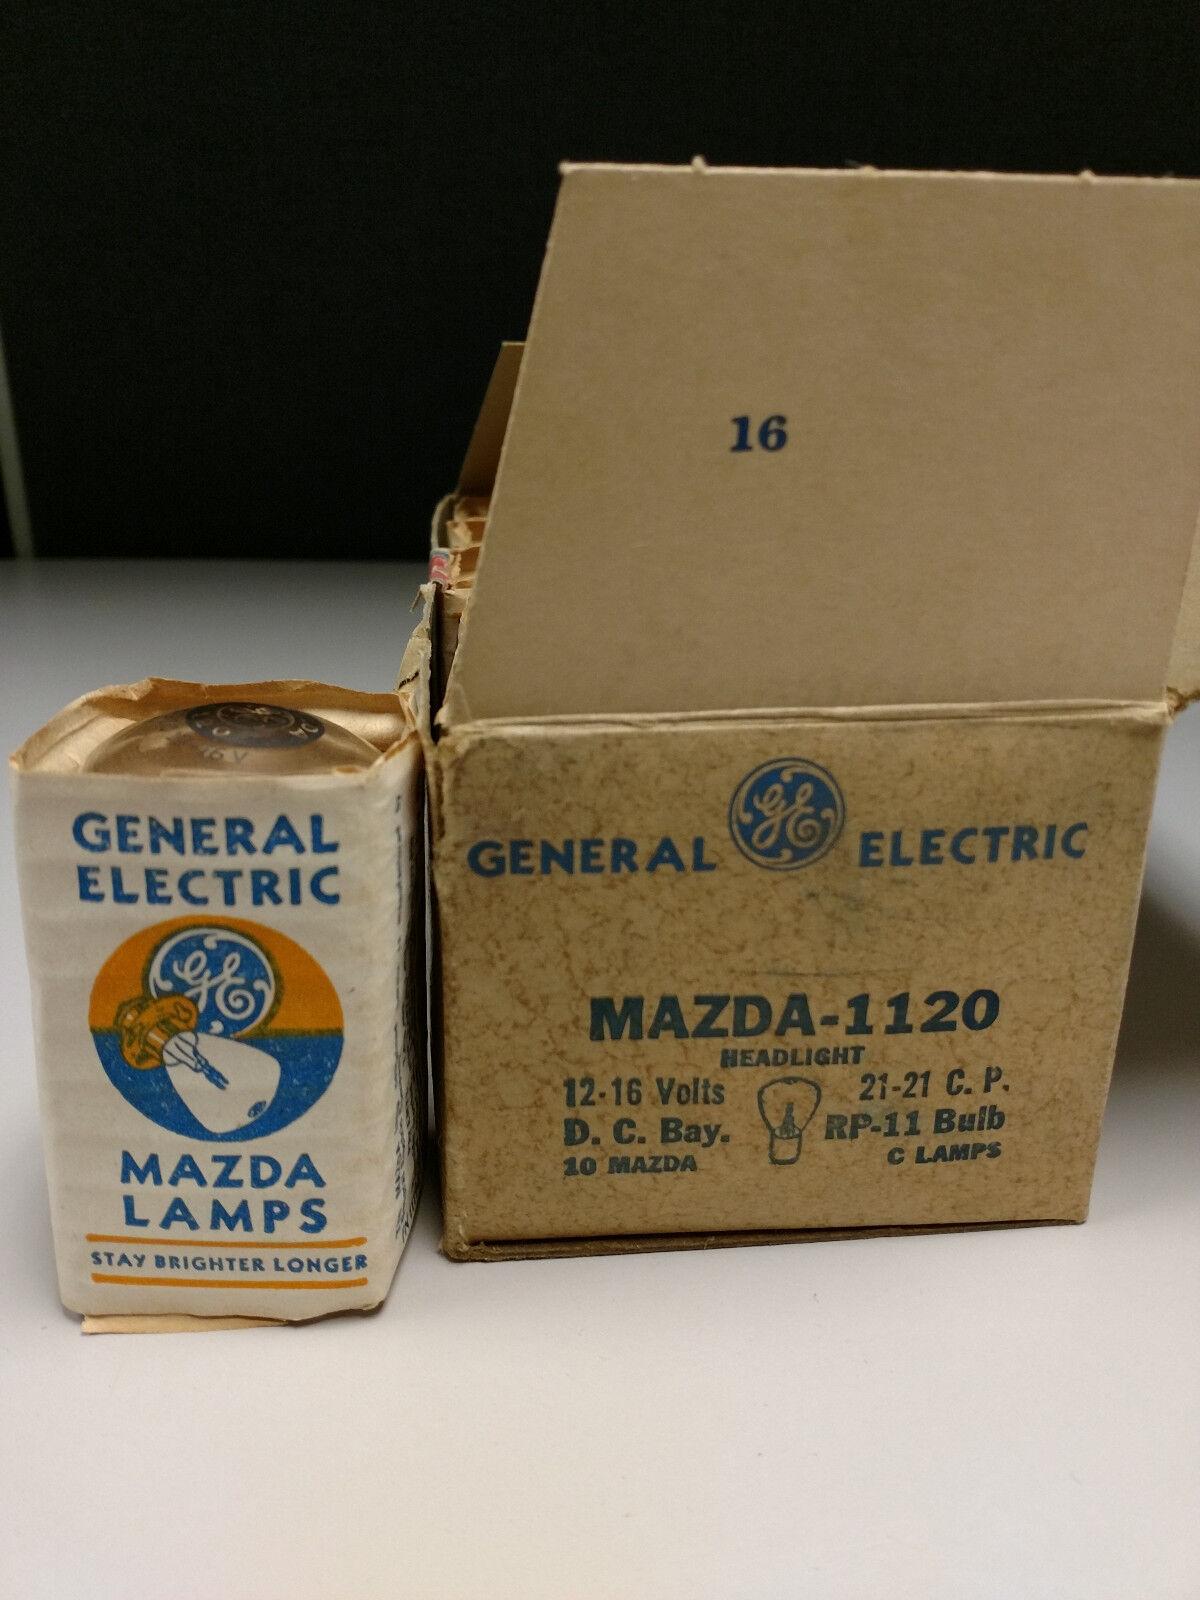 GE MAZDA 1120 (New Old Stock) Dual Filament 12V 21CP RP-11 Lamps (SINGLE LAMP)